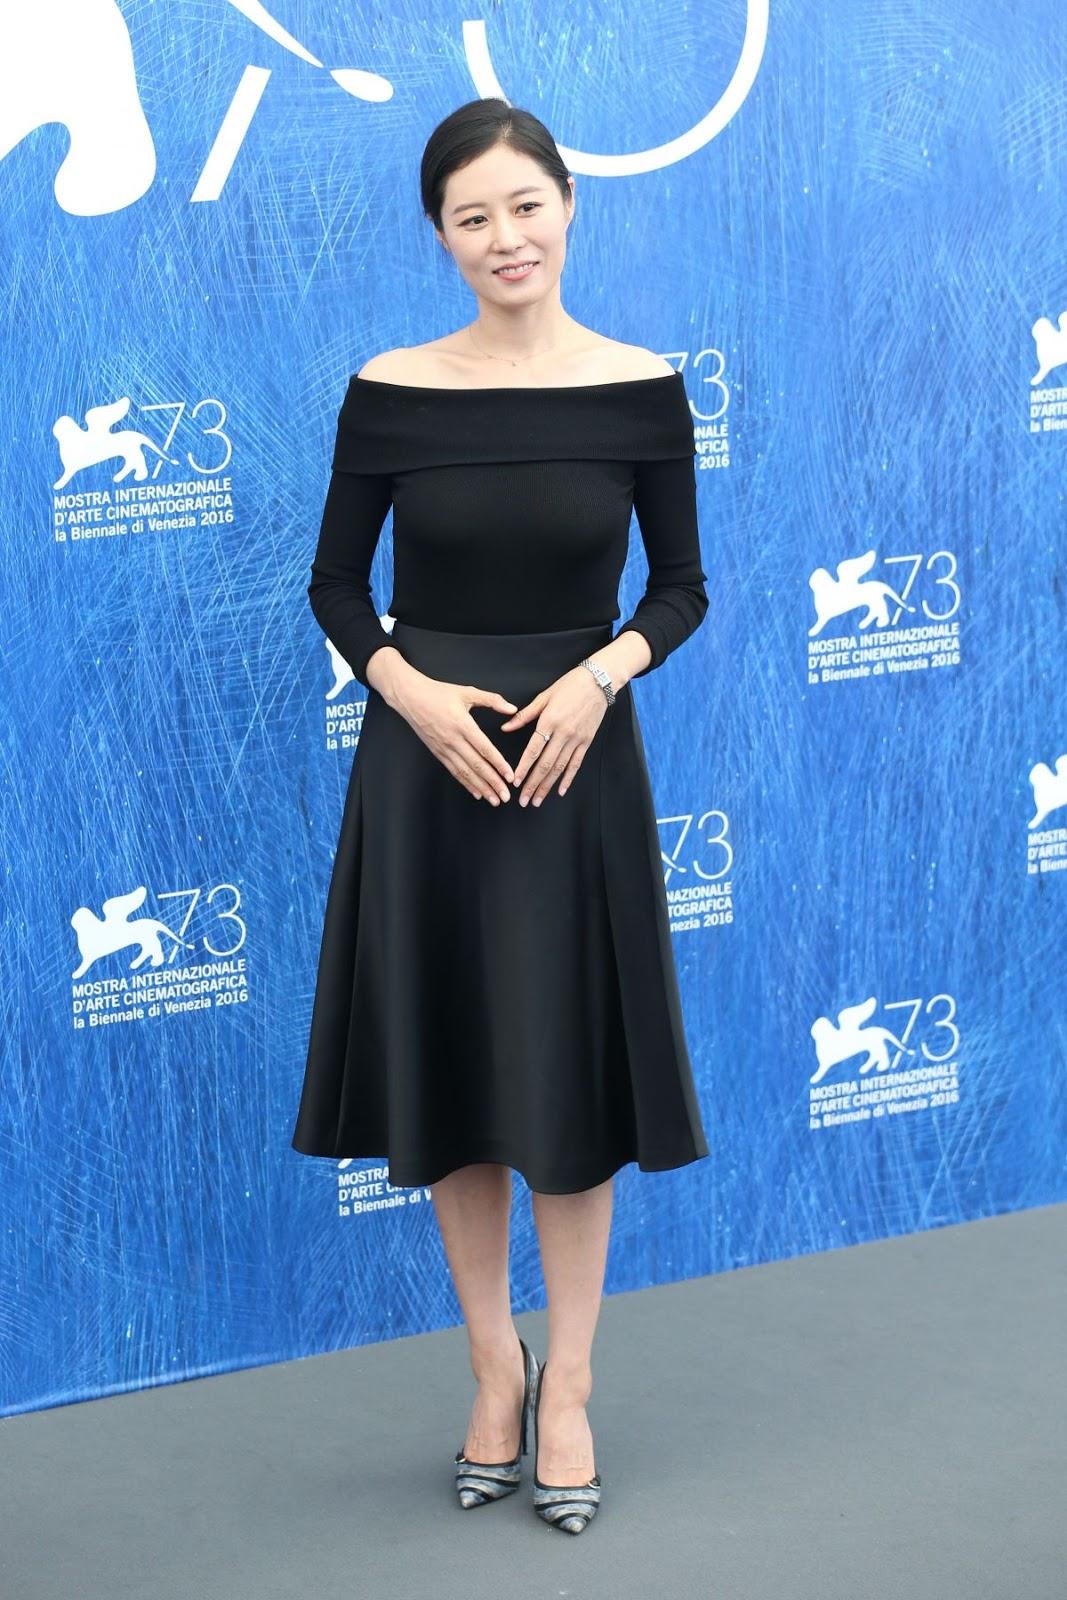 HQ Photos of South Korean actress Moon So-ri at 2016 73rd Venice Film Festival Jury Photocall in Venice